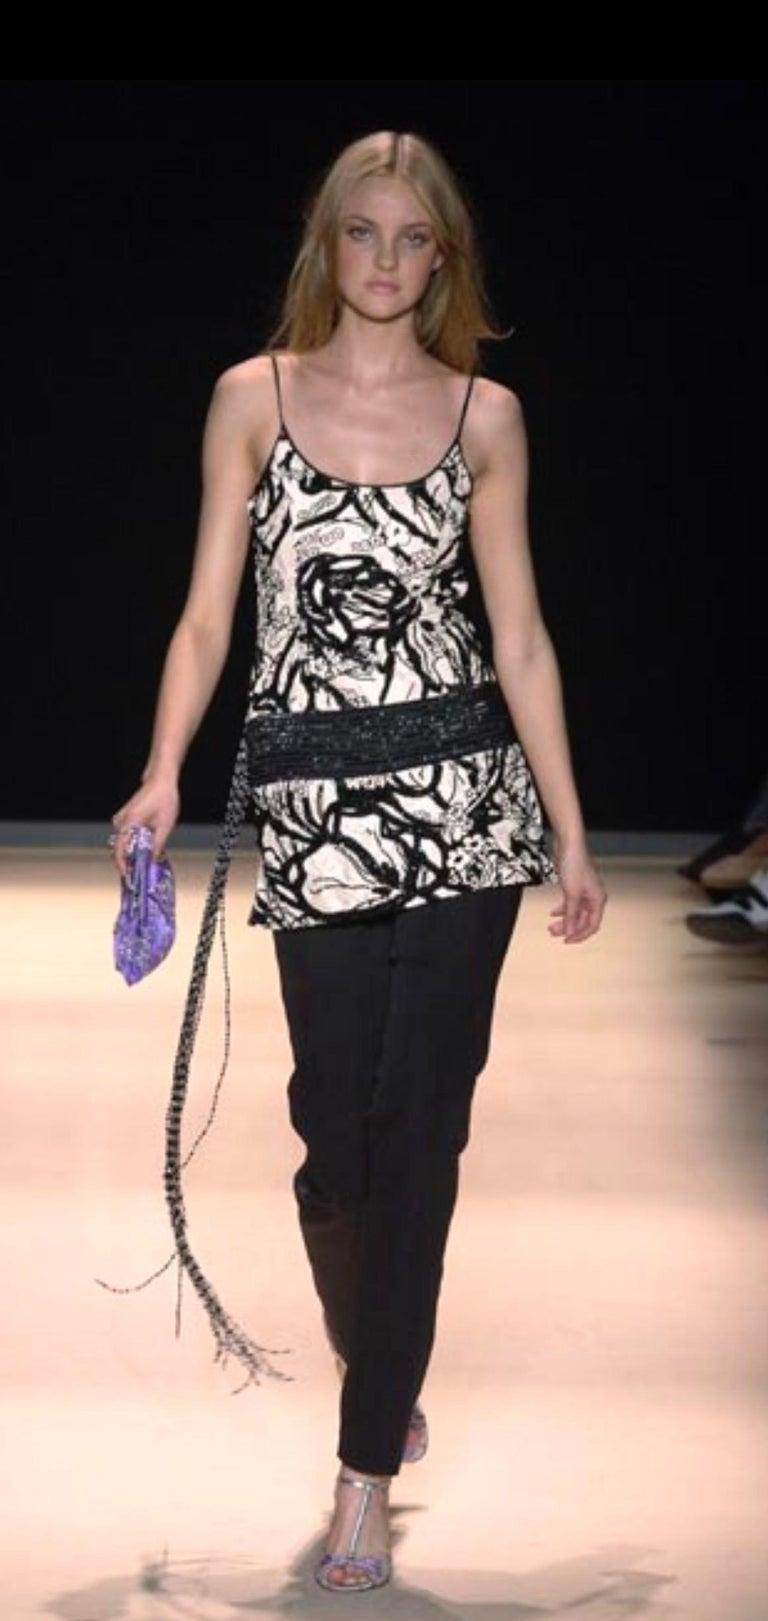 Salvatore Ferragamo Embroidered Nude & Black Embellished Sequin Dress Tunic For Sale 4